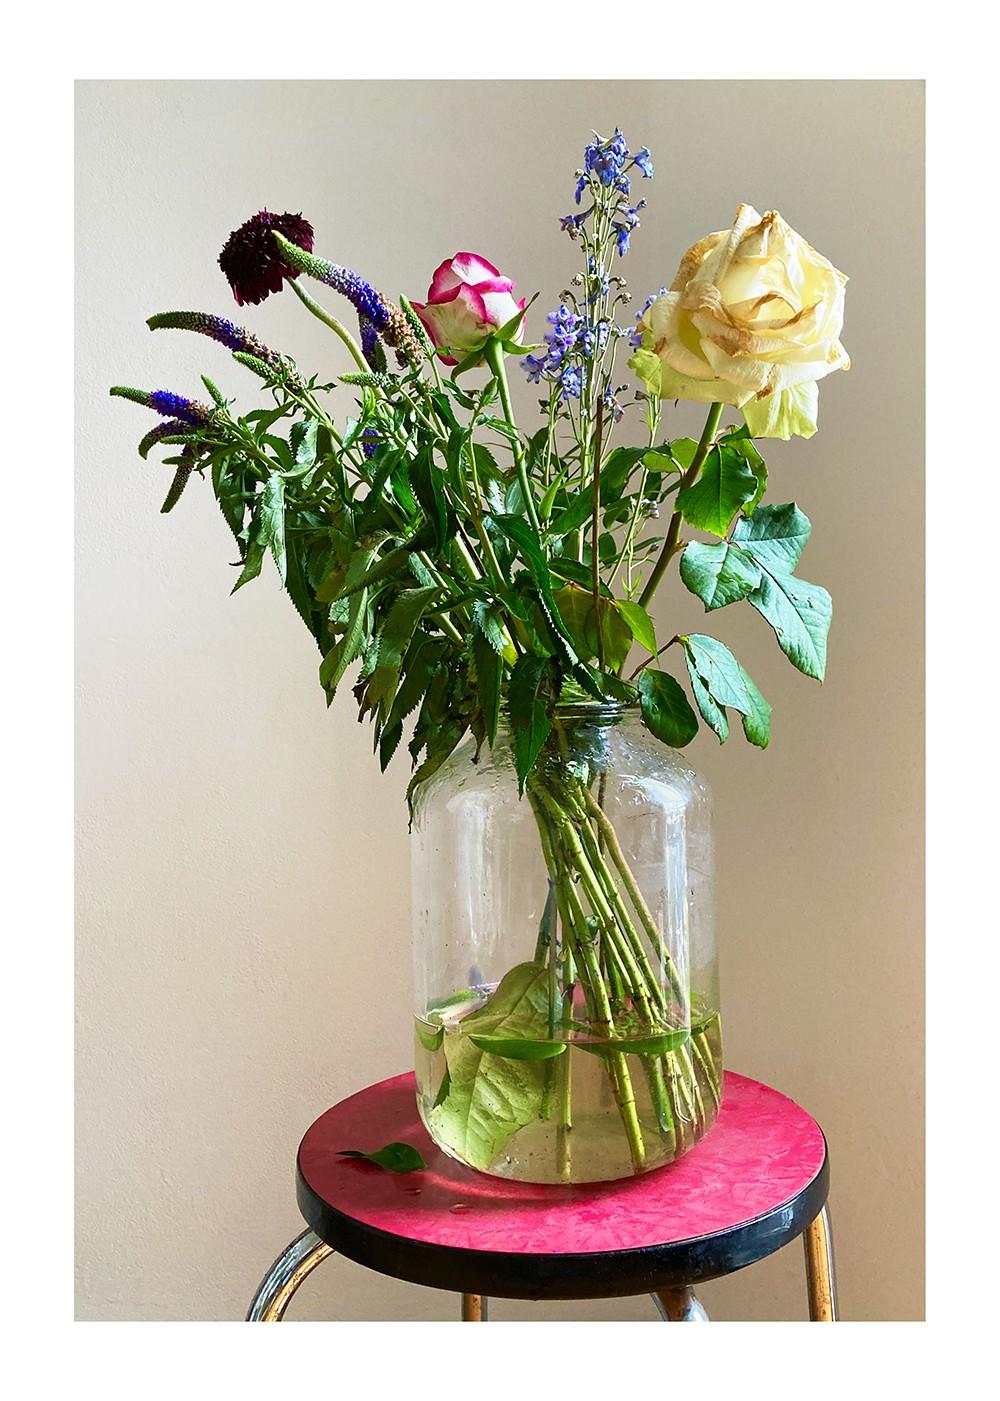 Maxim_Ryckaerts_Maxim-Ryckaerts-Last Flowers